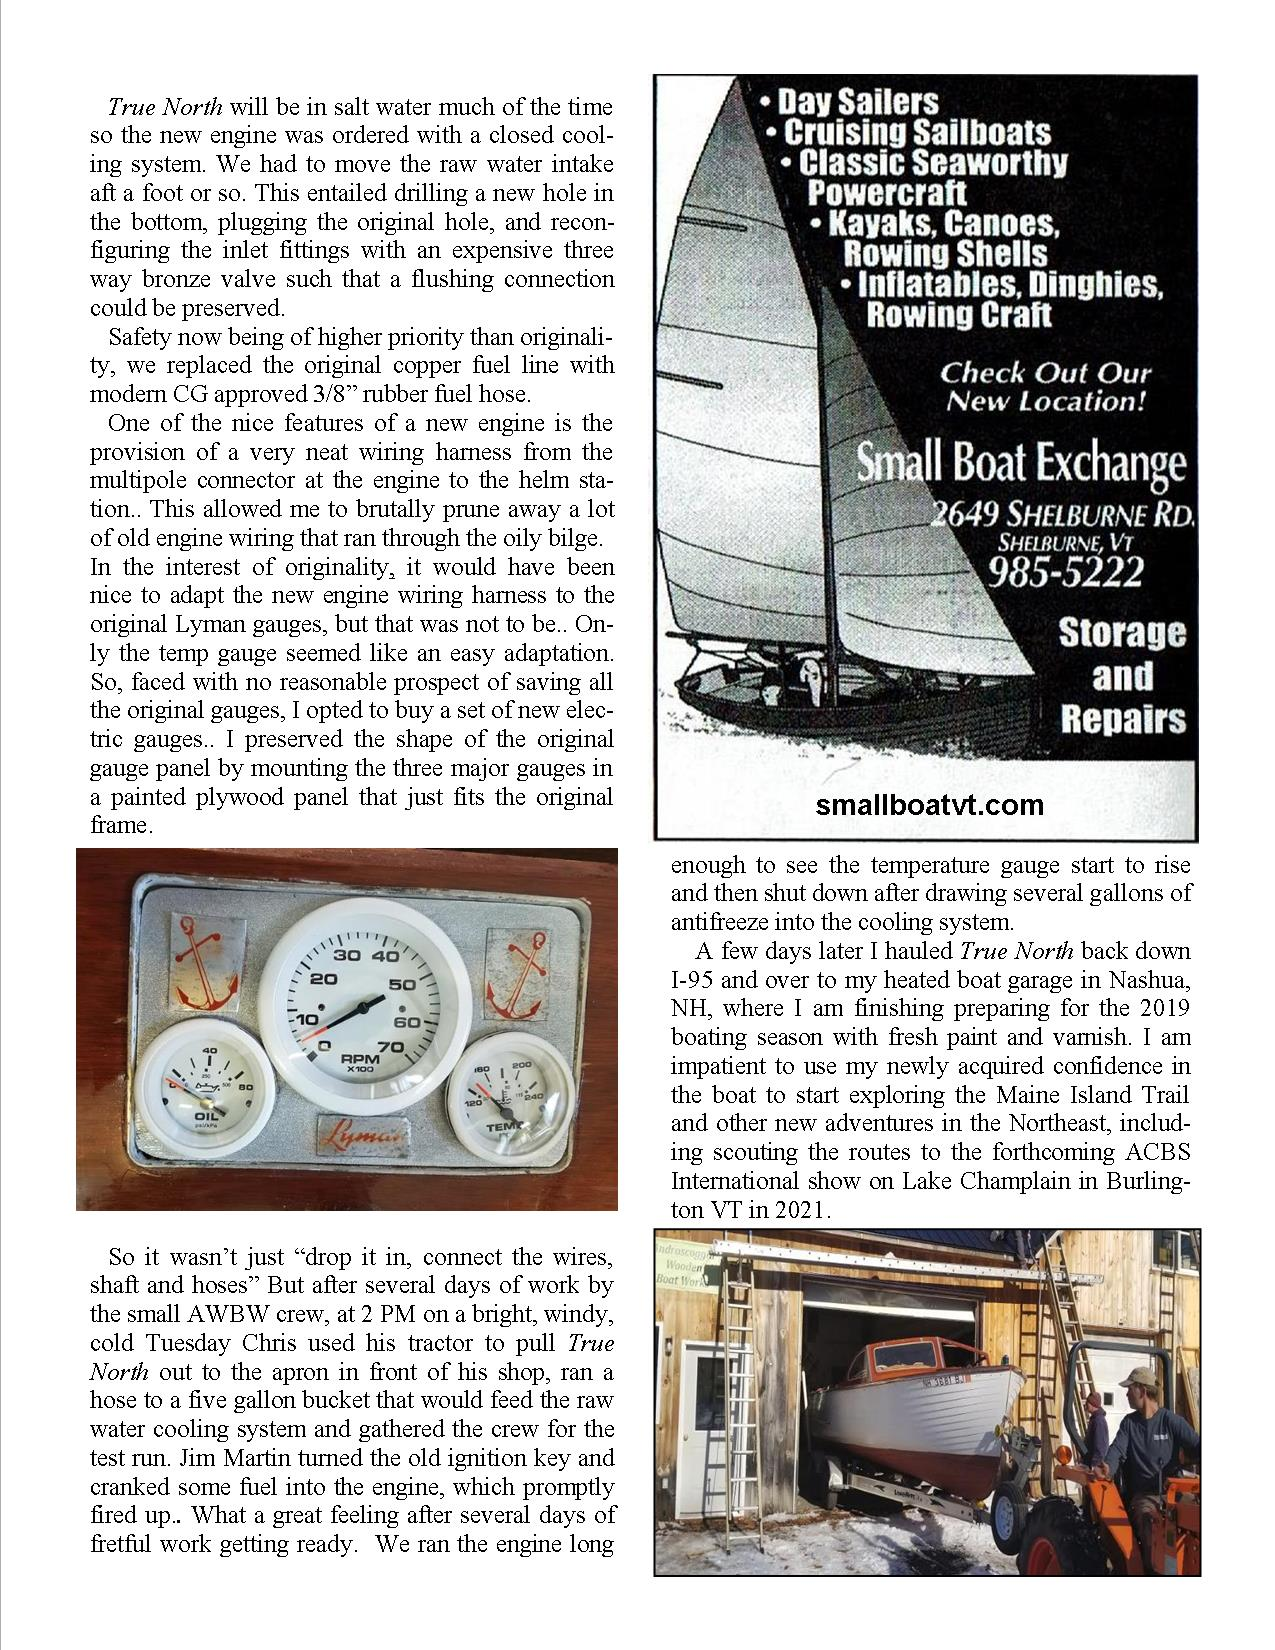 LCACBS Newletter 3.1.19 5.jpg